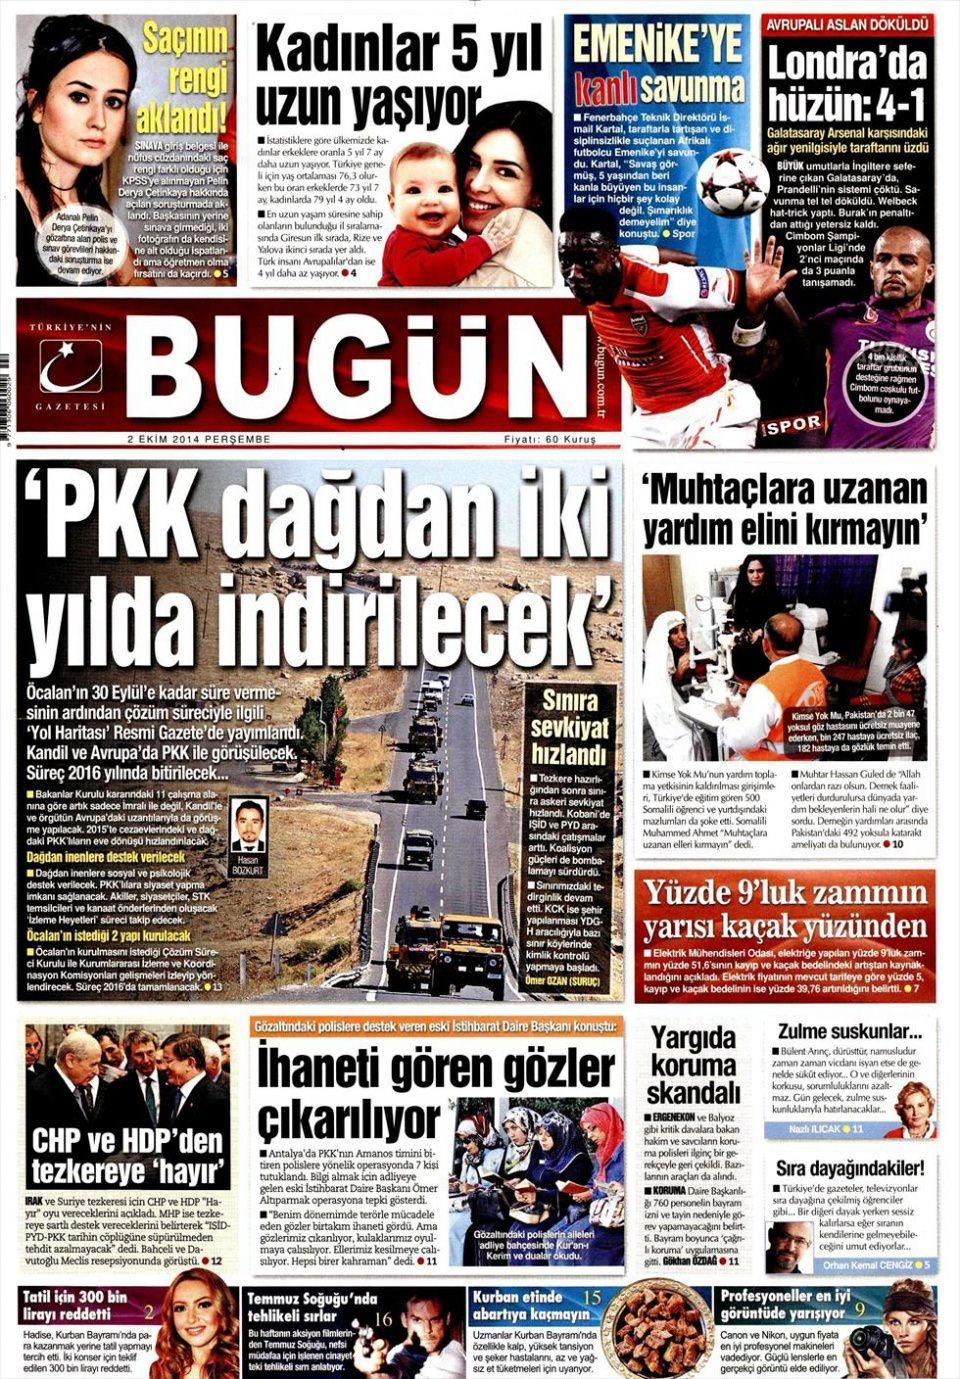 2 Ekim 2014 gazete manşetleri 3